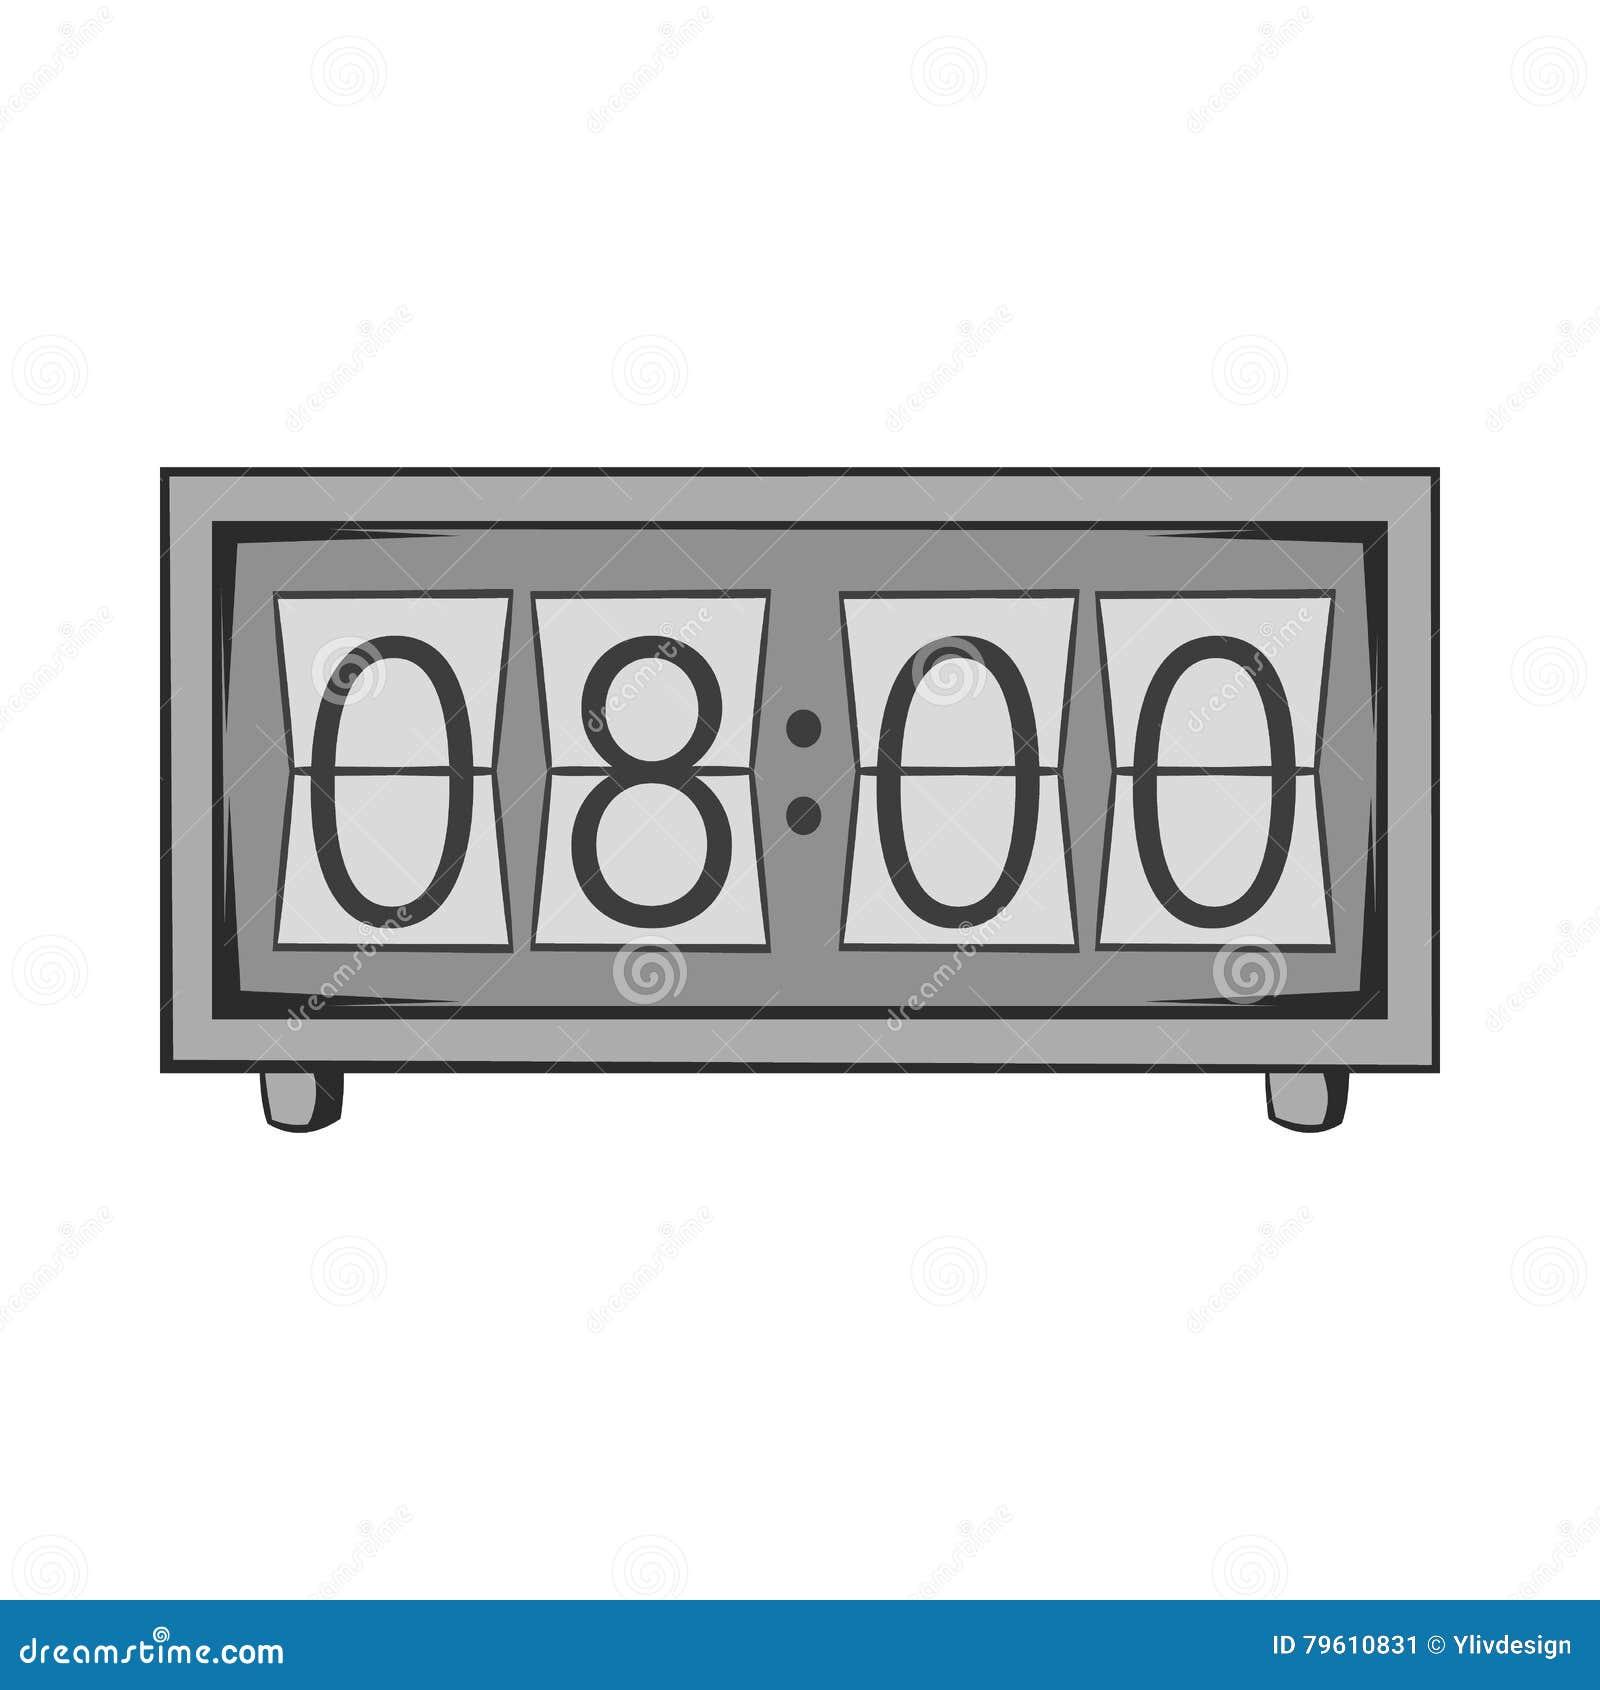 Ícone eletrônico do relógio, estilo monocromático preto